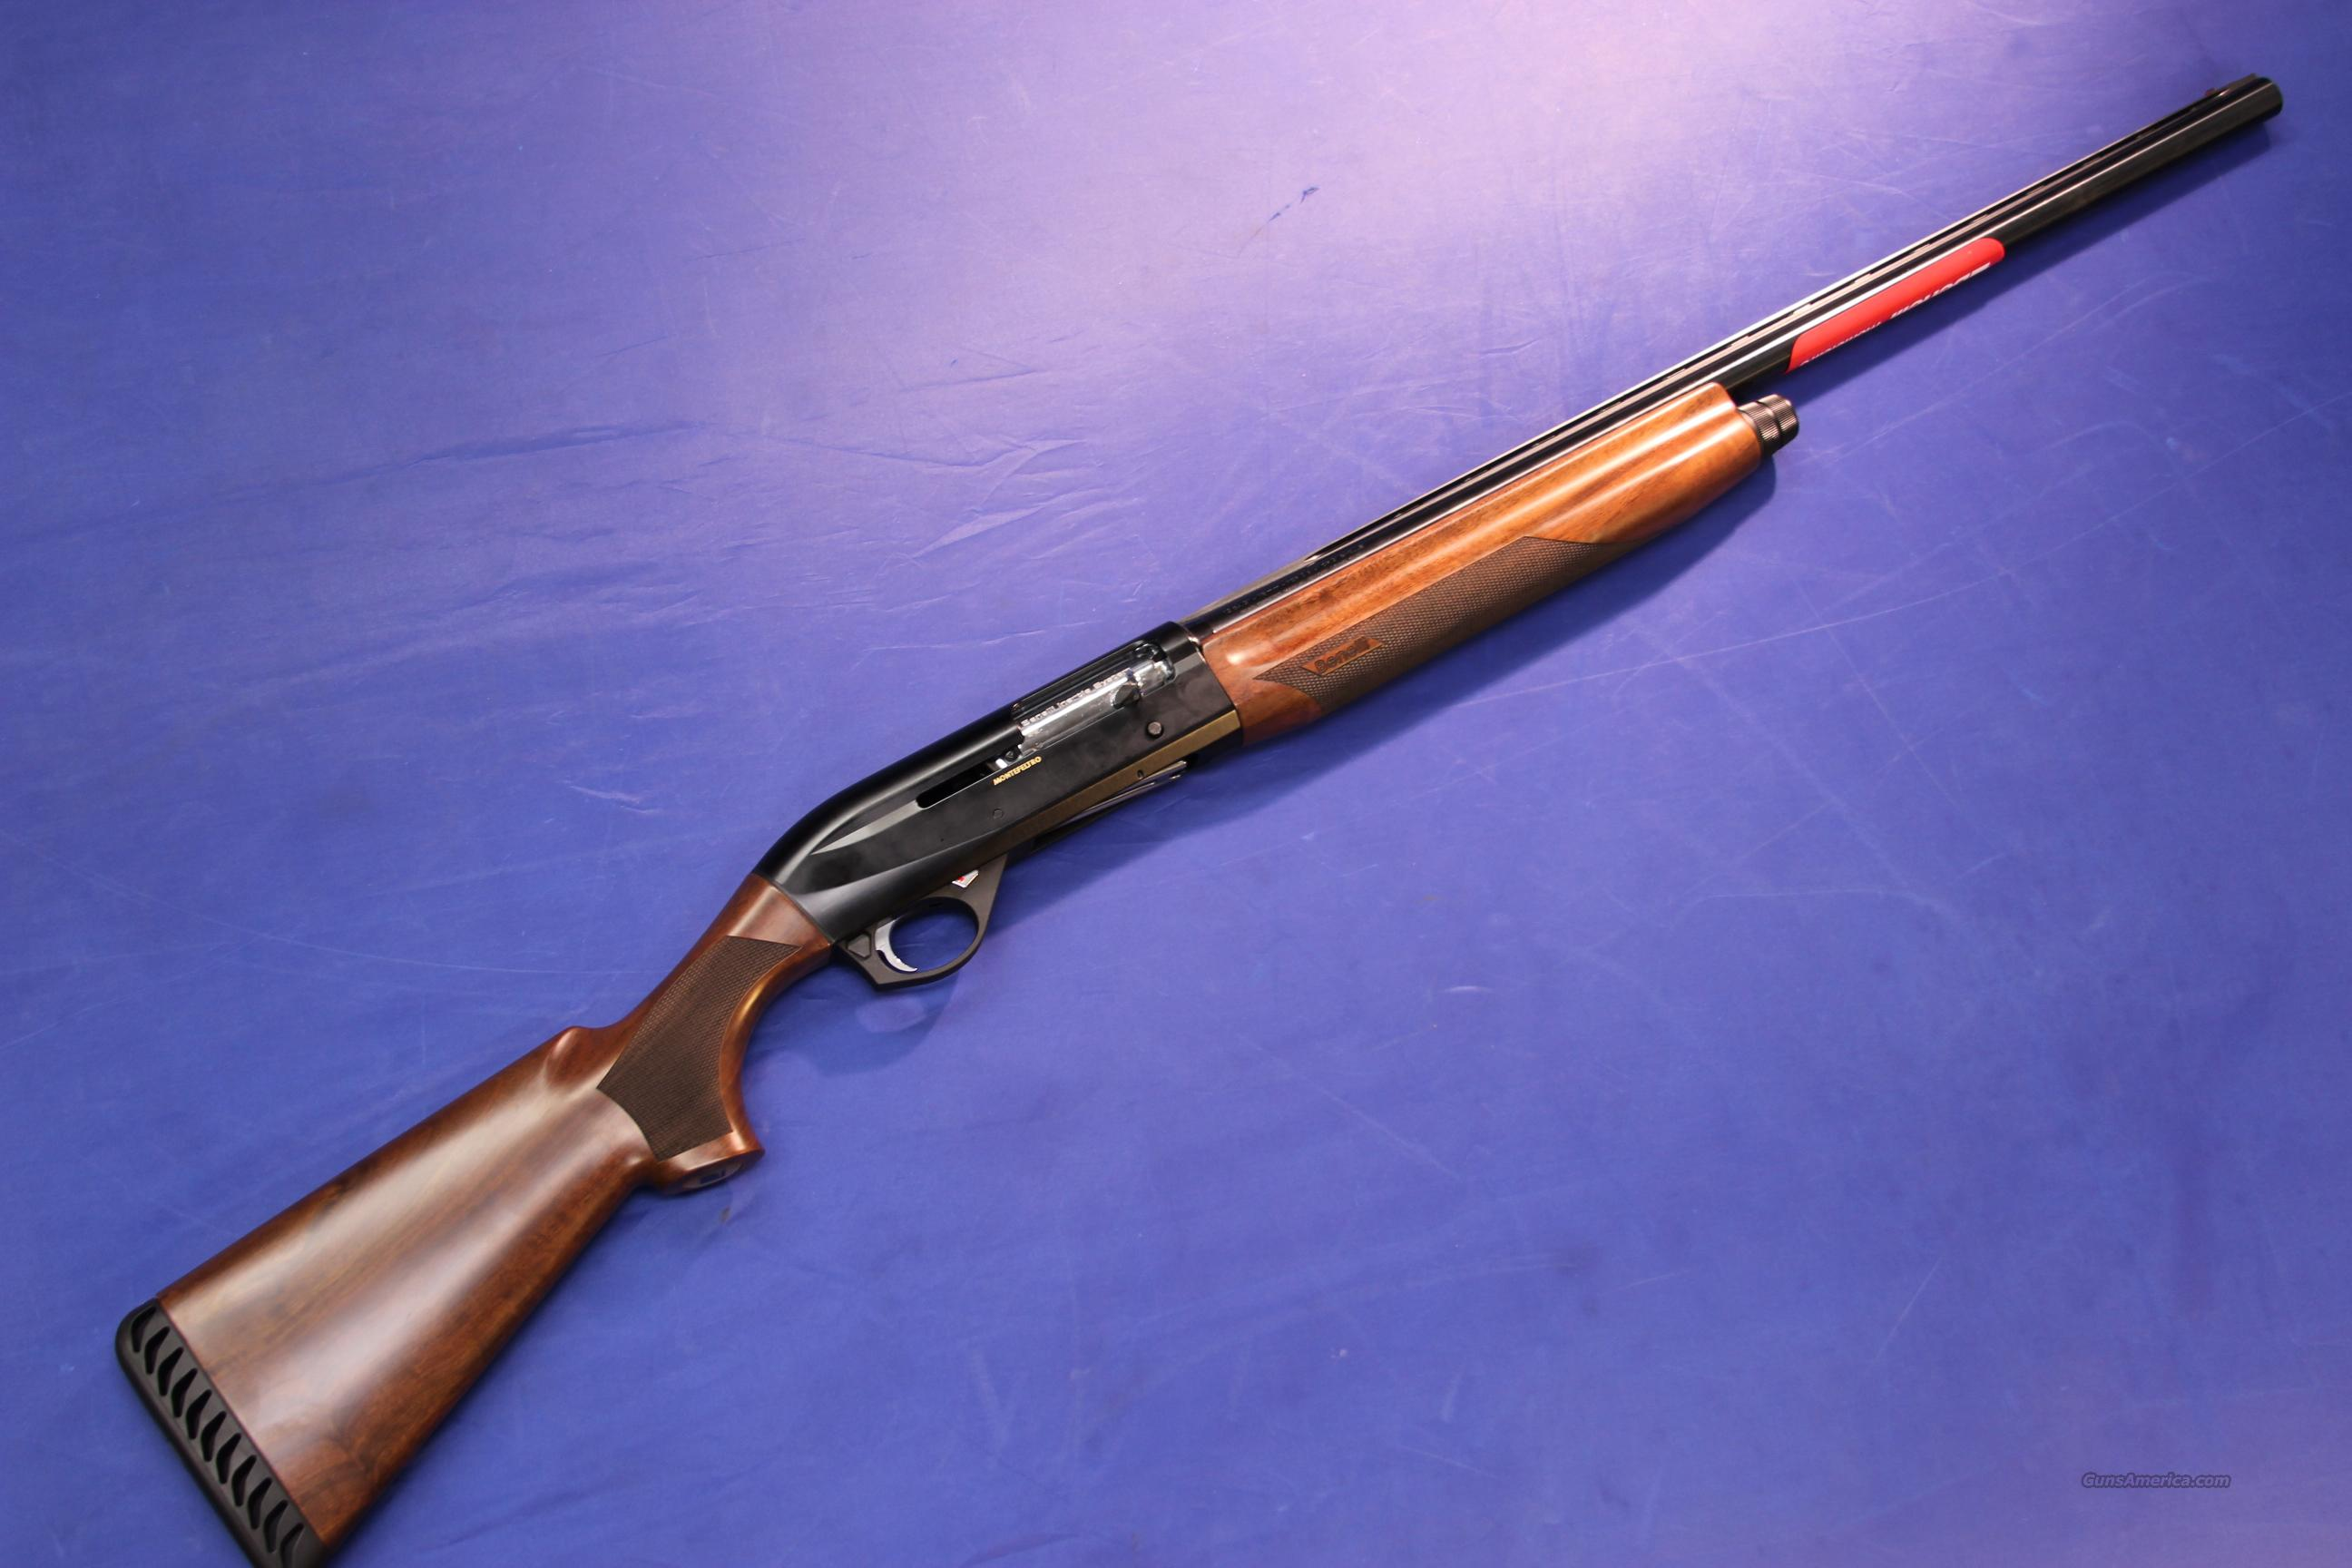 Benelli montefeltro 12 gauge 28 quot new guns gt shotguns gt benelli